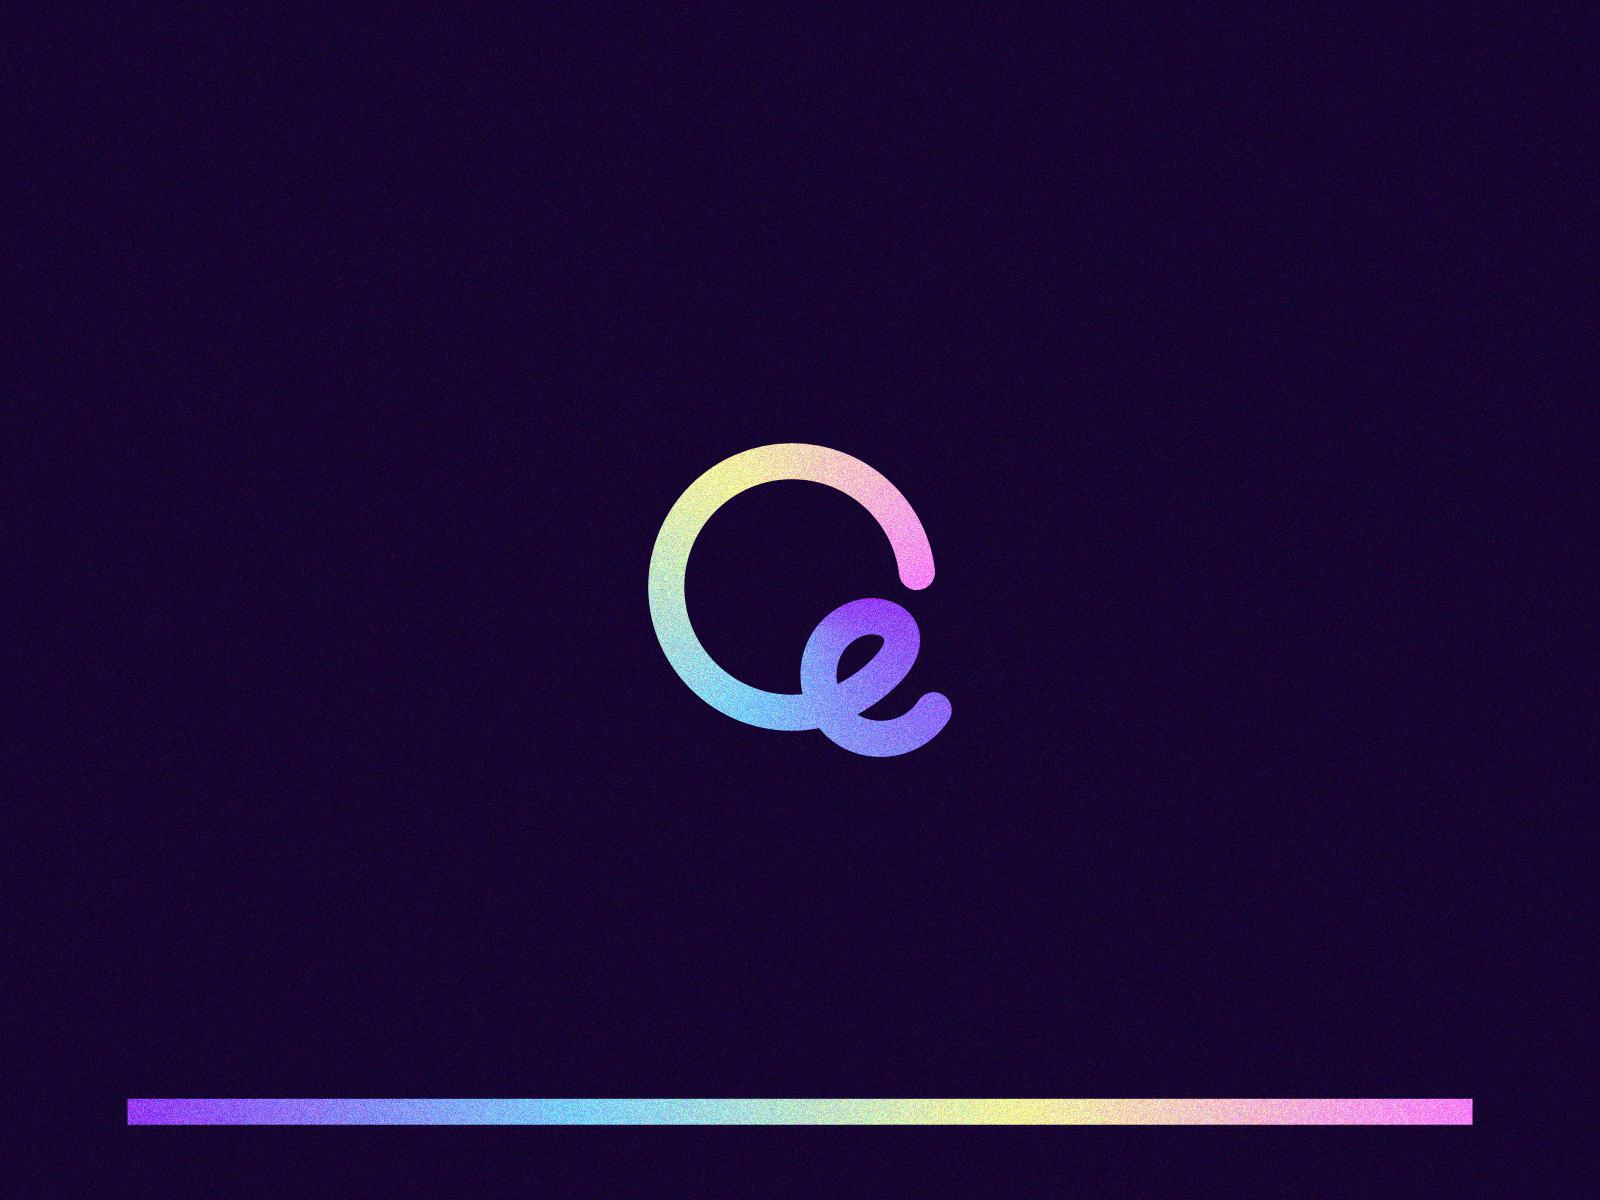 eQ Logo flowing unique creative illustration graphic colorful line gradient symbol lettermark letter design branding logomark logo mark q e qe eq